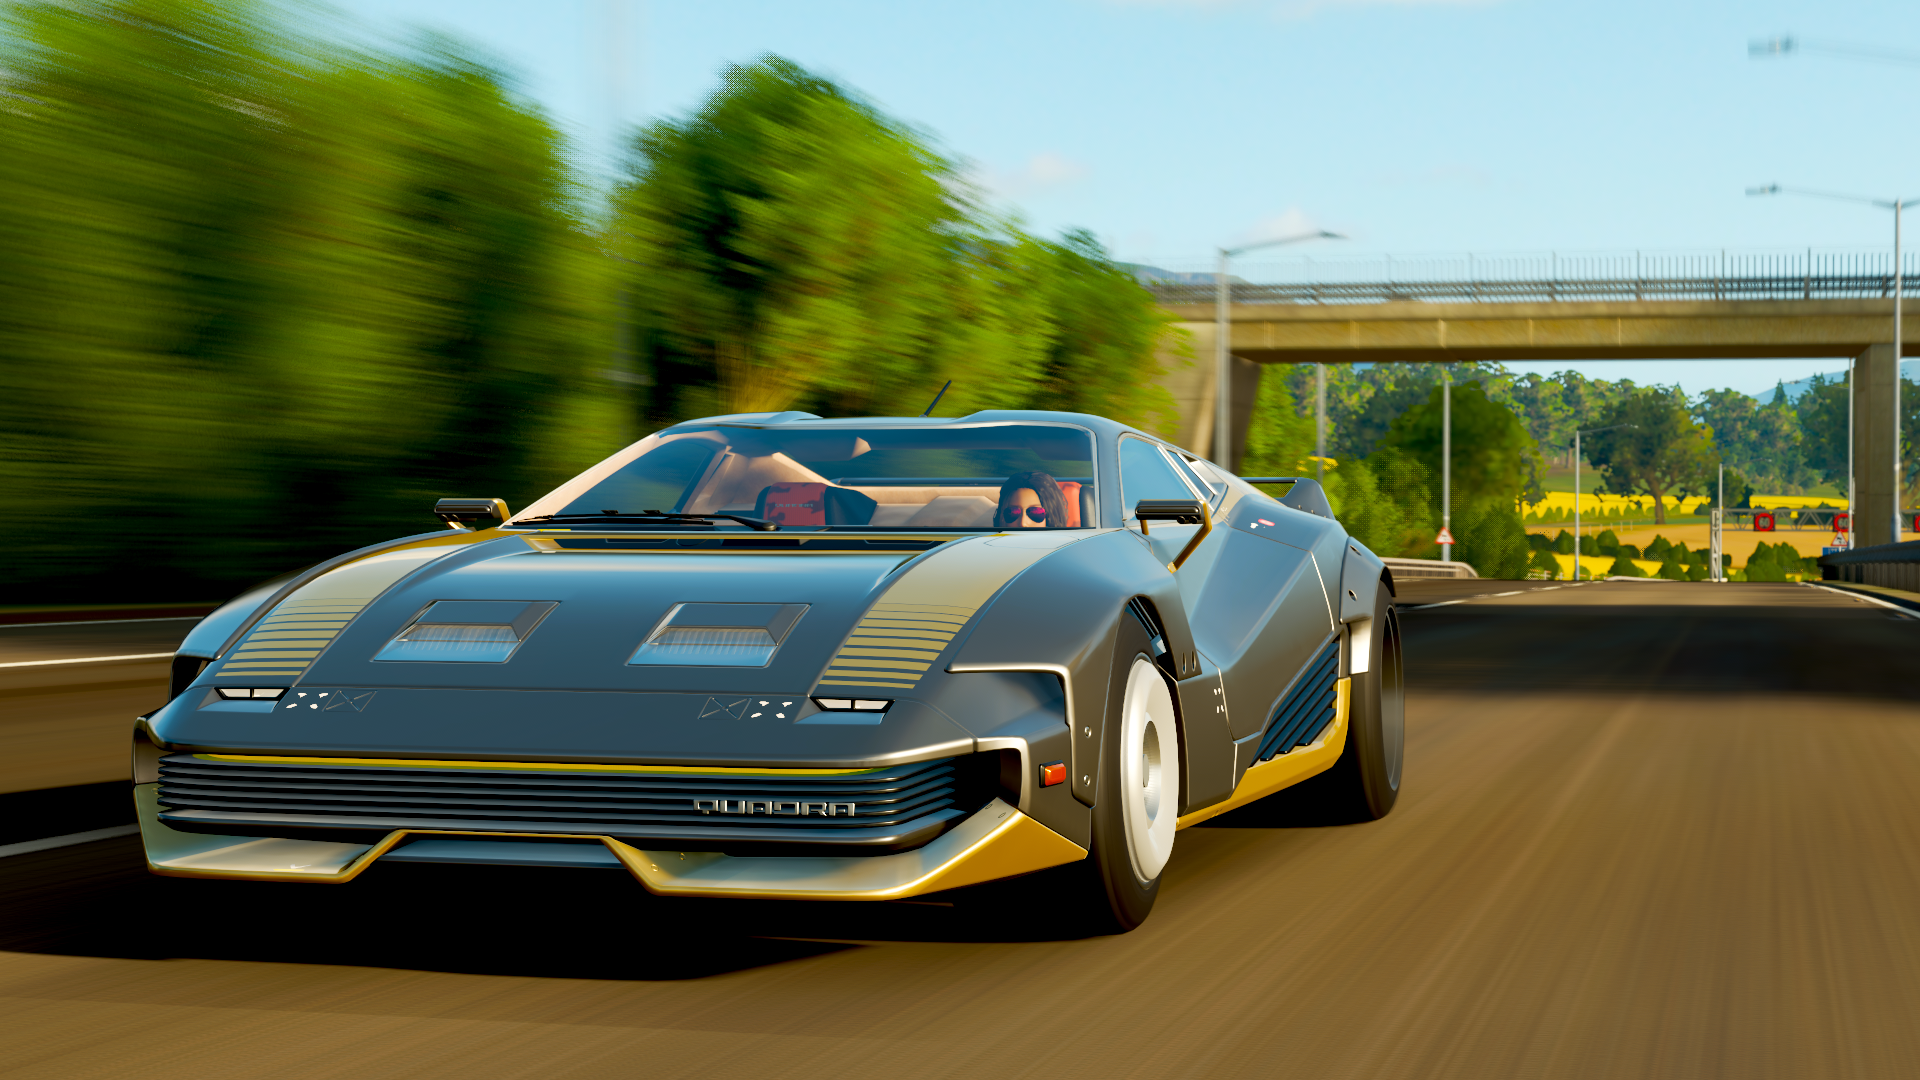 Forza Horizon 4 is getting a Cyberpunk 2077 vehicle tomorrow